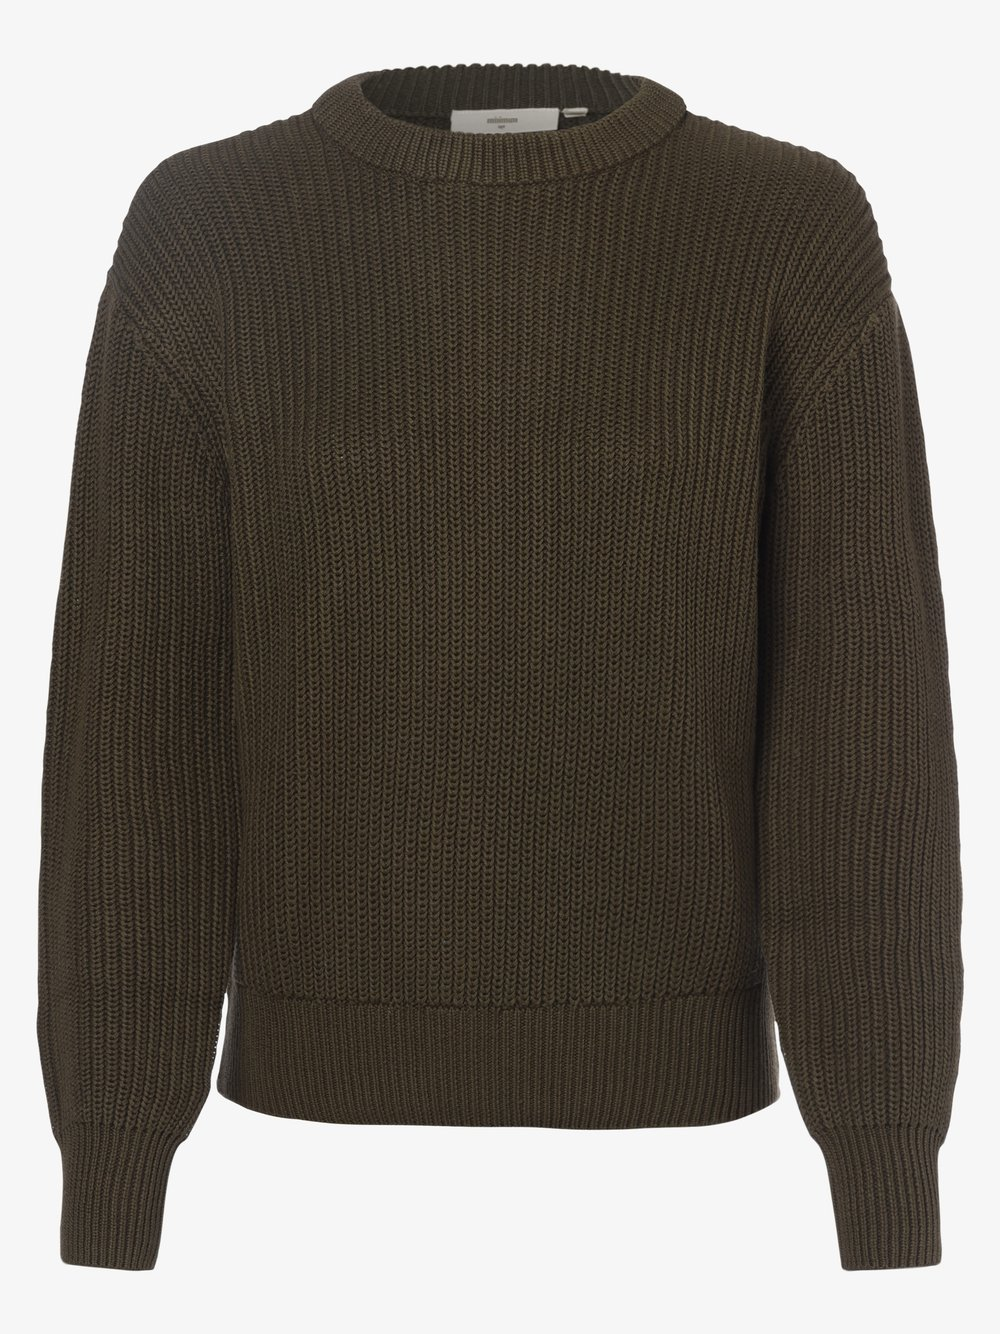 Minimum – Sweter damski – Mikala, zielony Van Graaf 484382-0001-09940